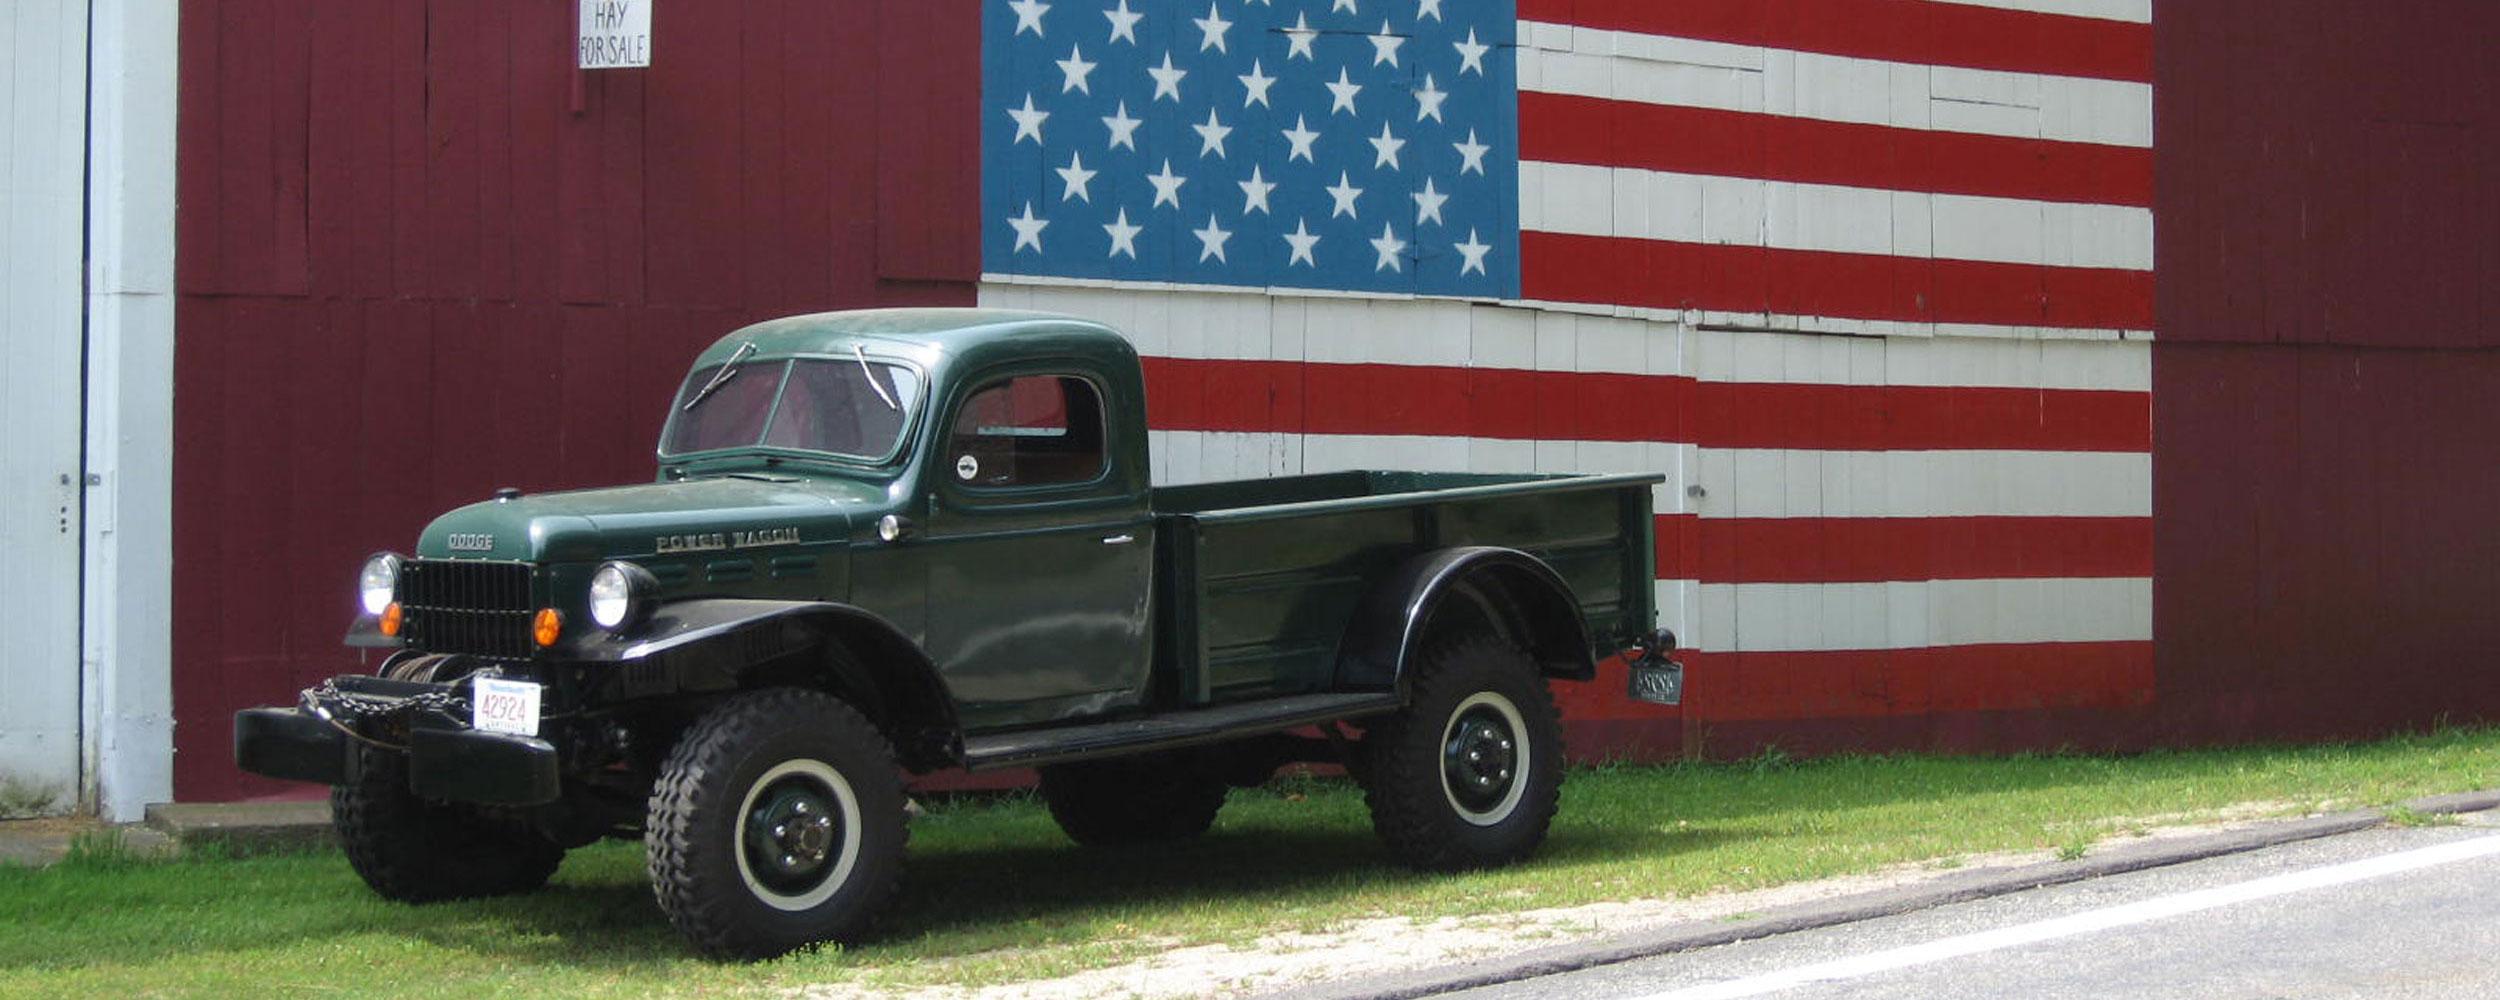 Power Wagon Page 1954 Dodge Joe Cimoch Webster Ma 1968 Wm300